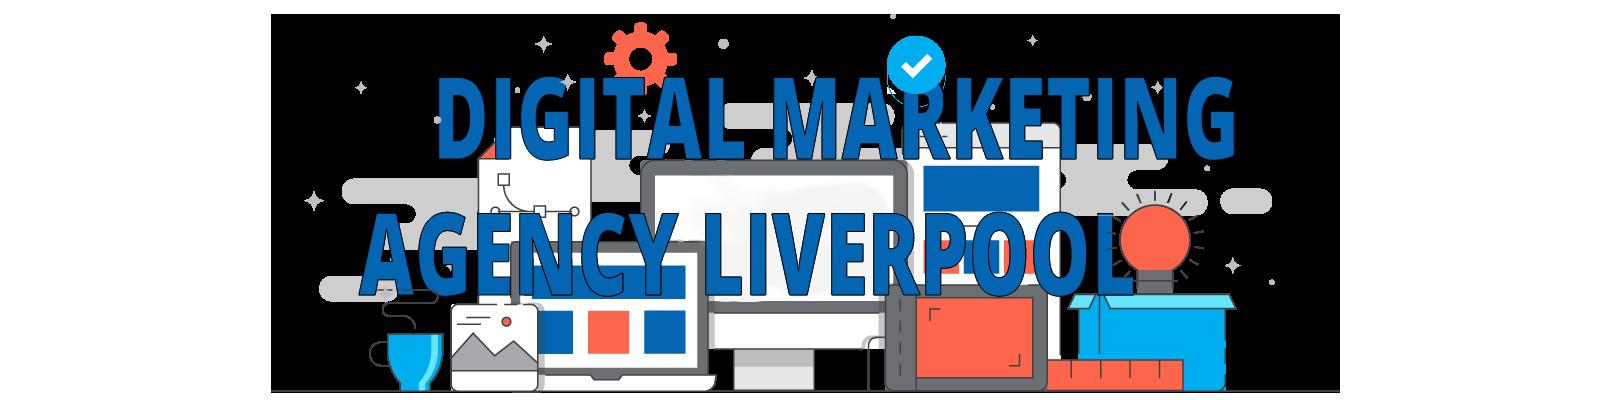 Digital-Marketing-Agency-Liverpool